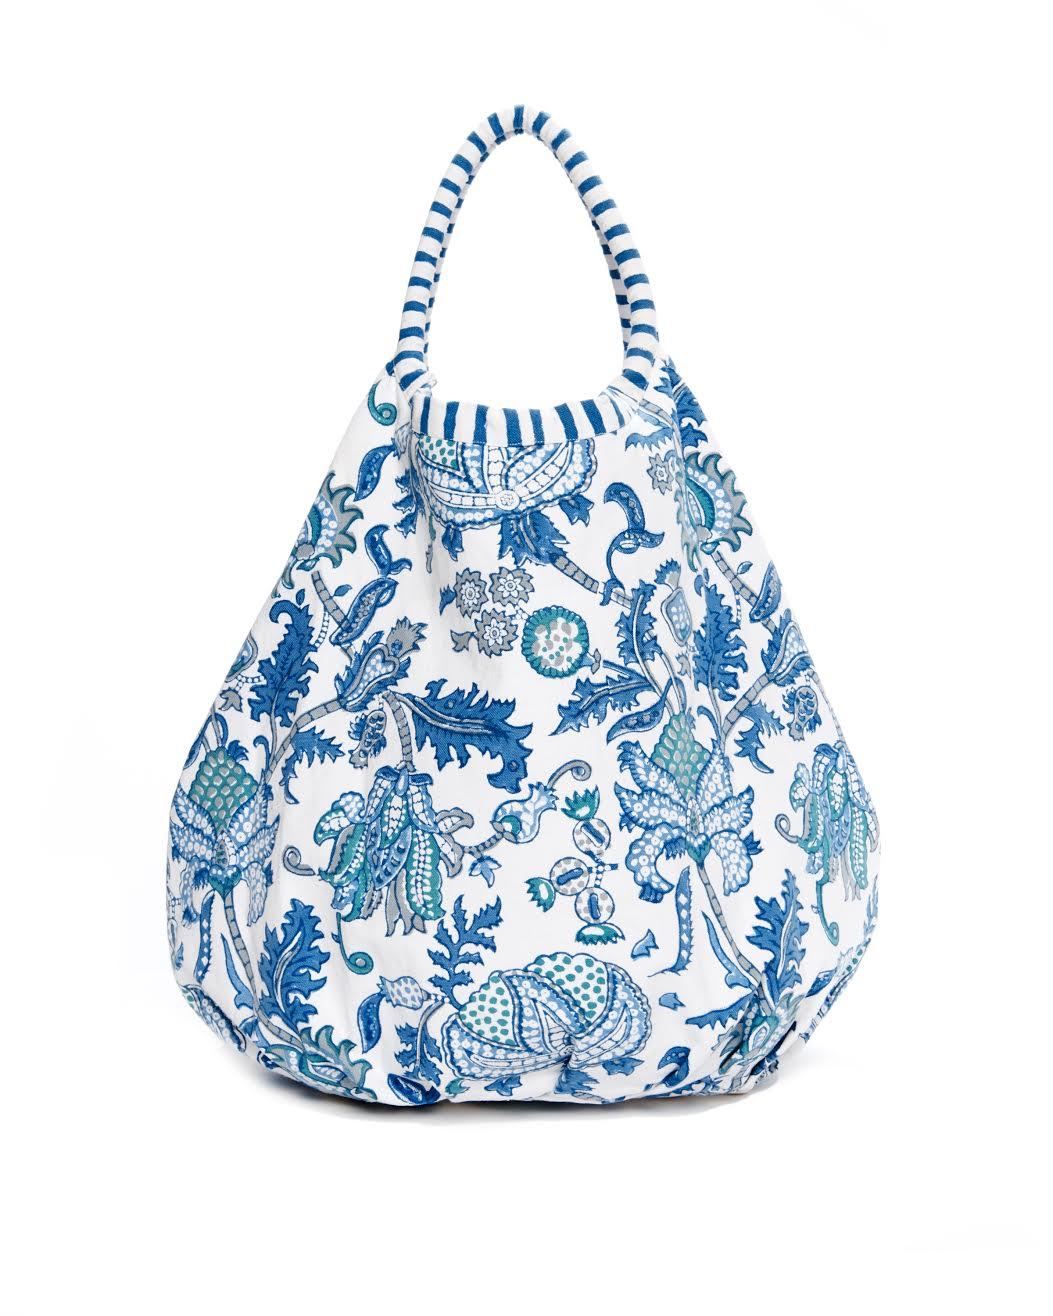 Roberta Roller Rabbit: Bondi Beach Bag